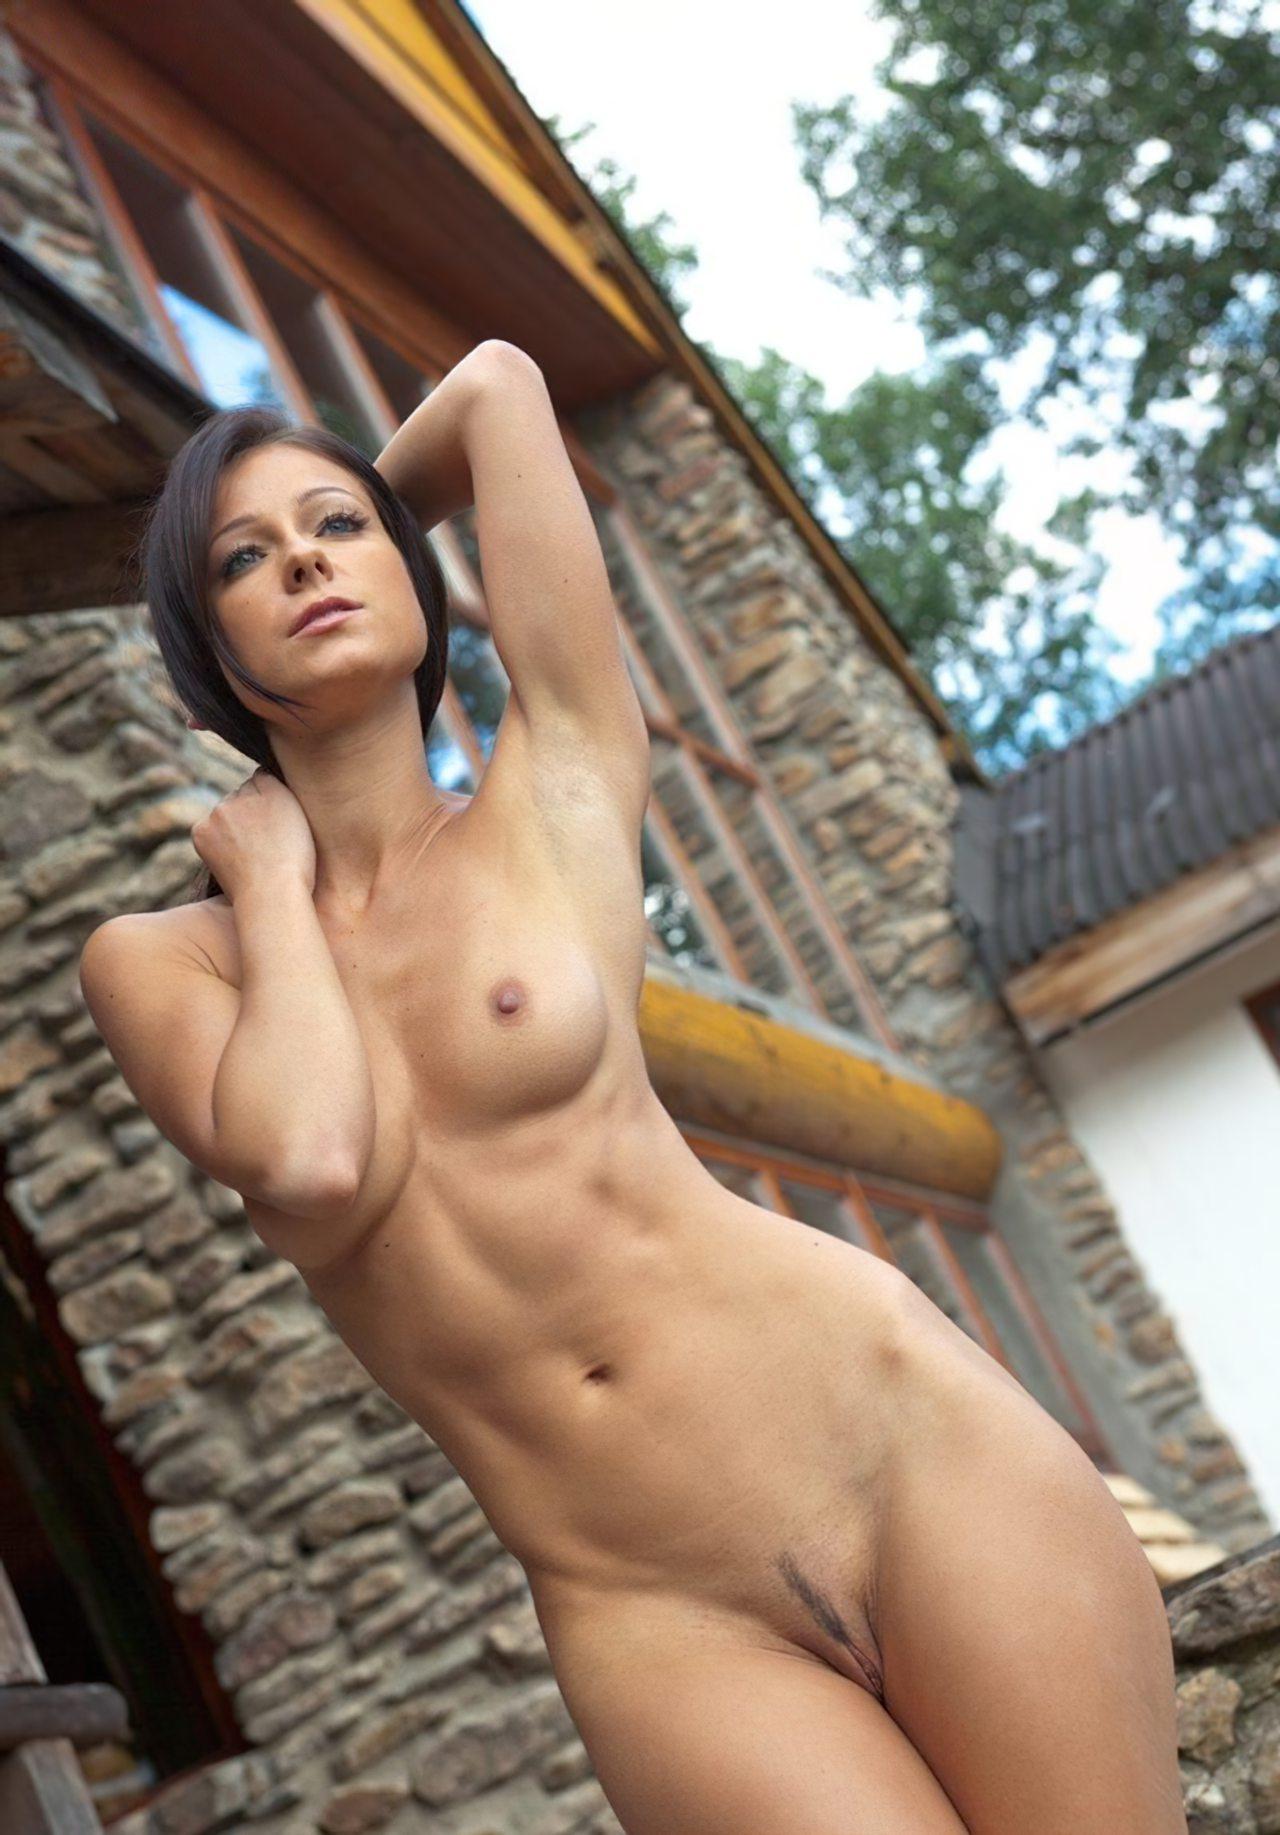 Mulheres Despidas (25)